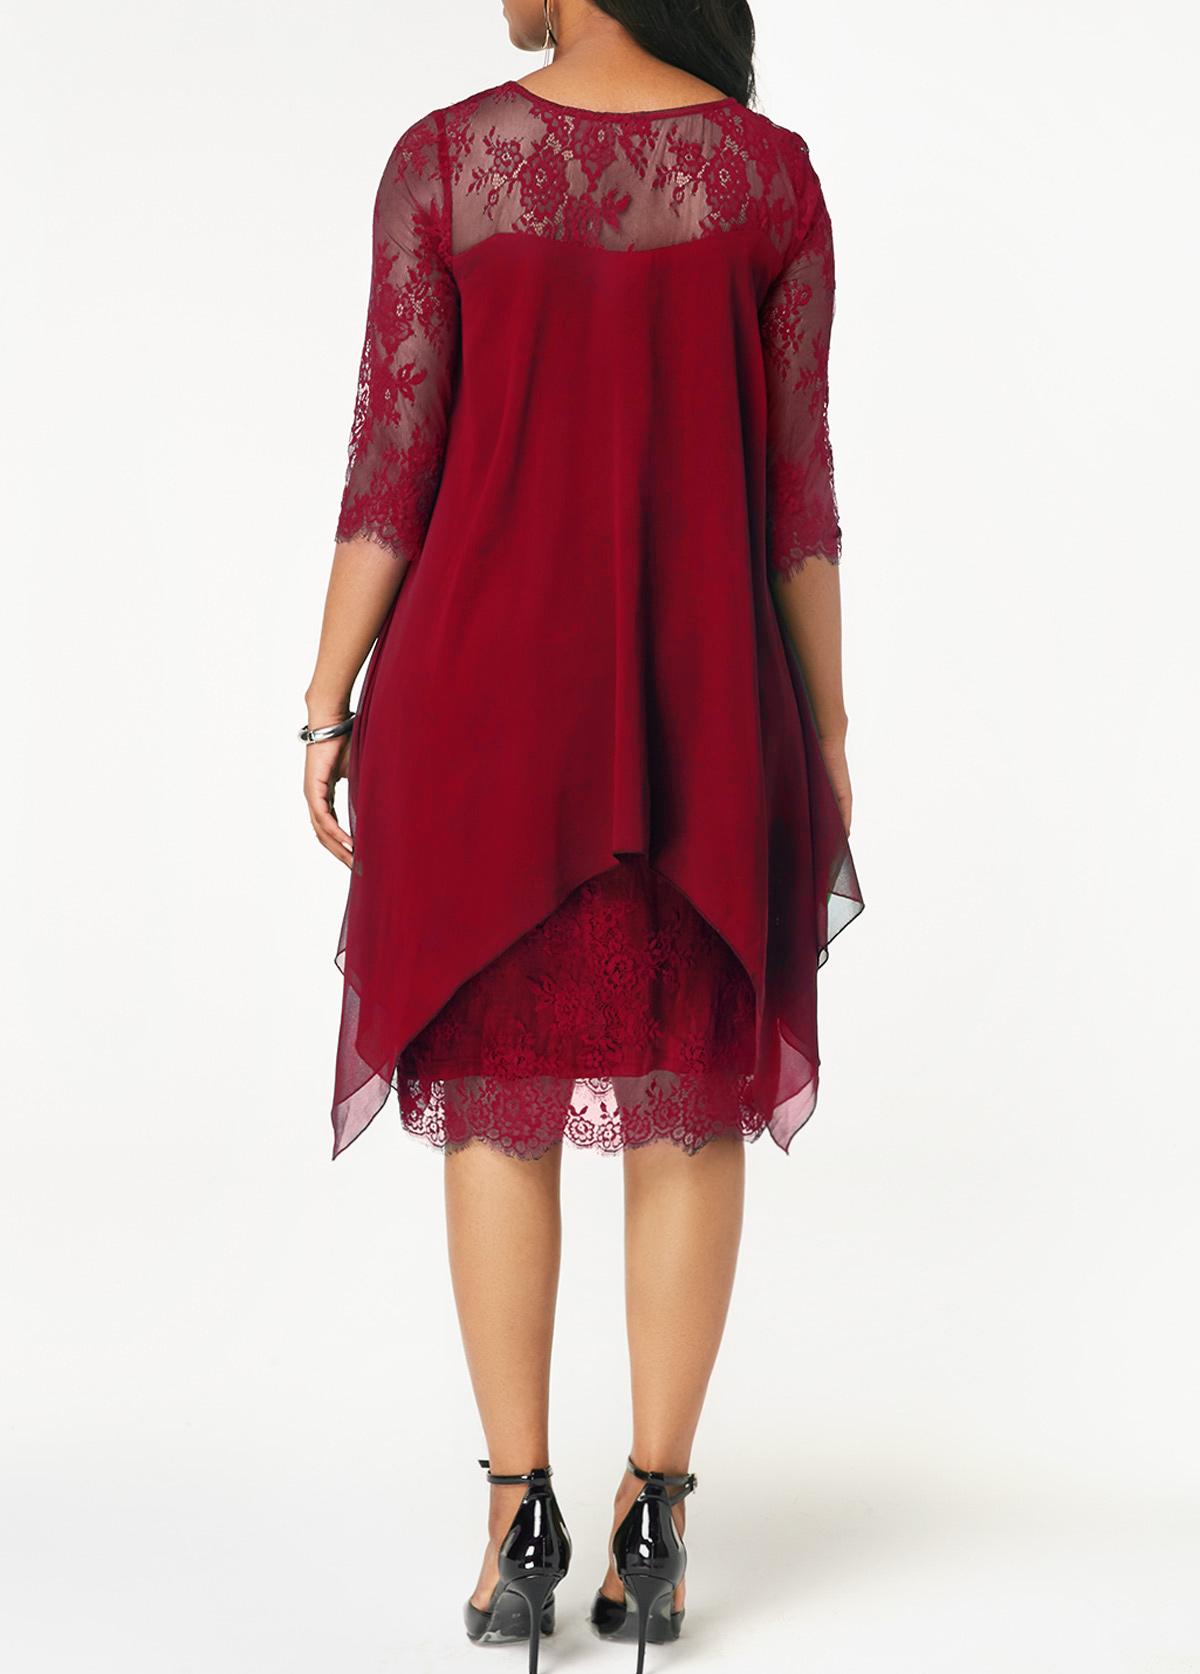 Three Quarter Sleeve Wine Red Lace Dress